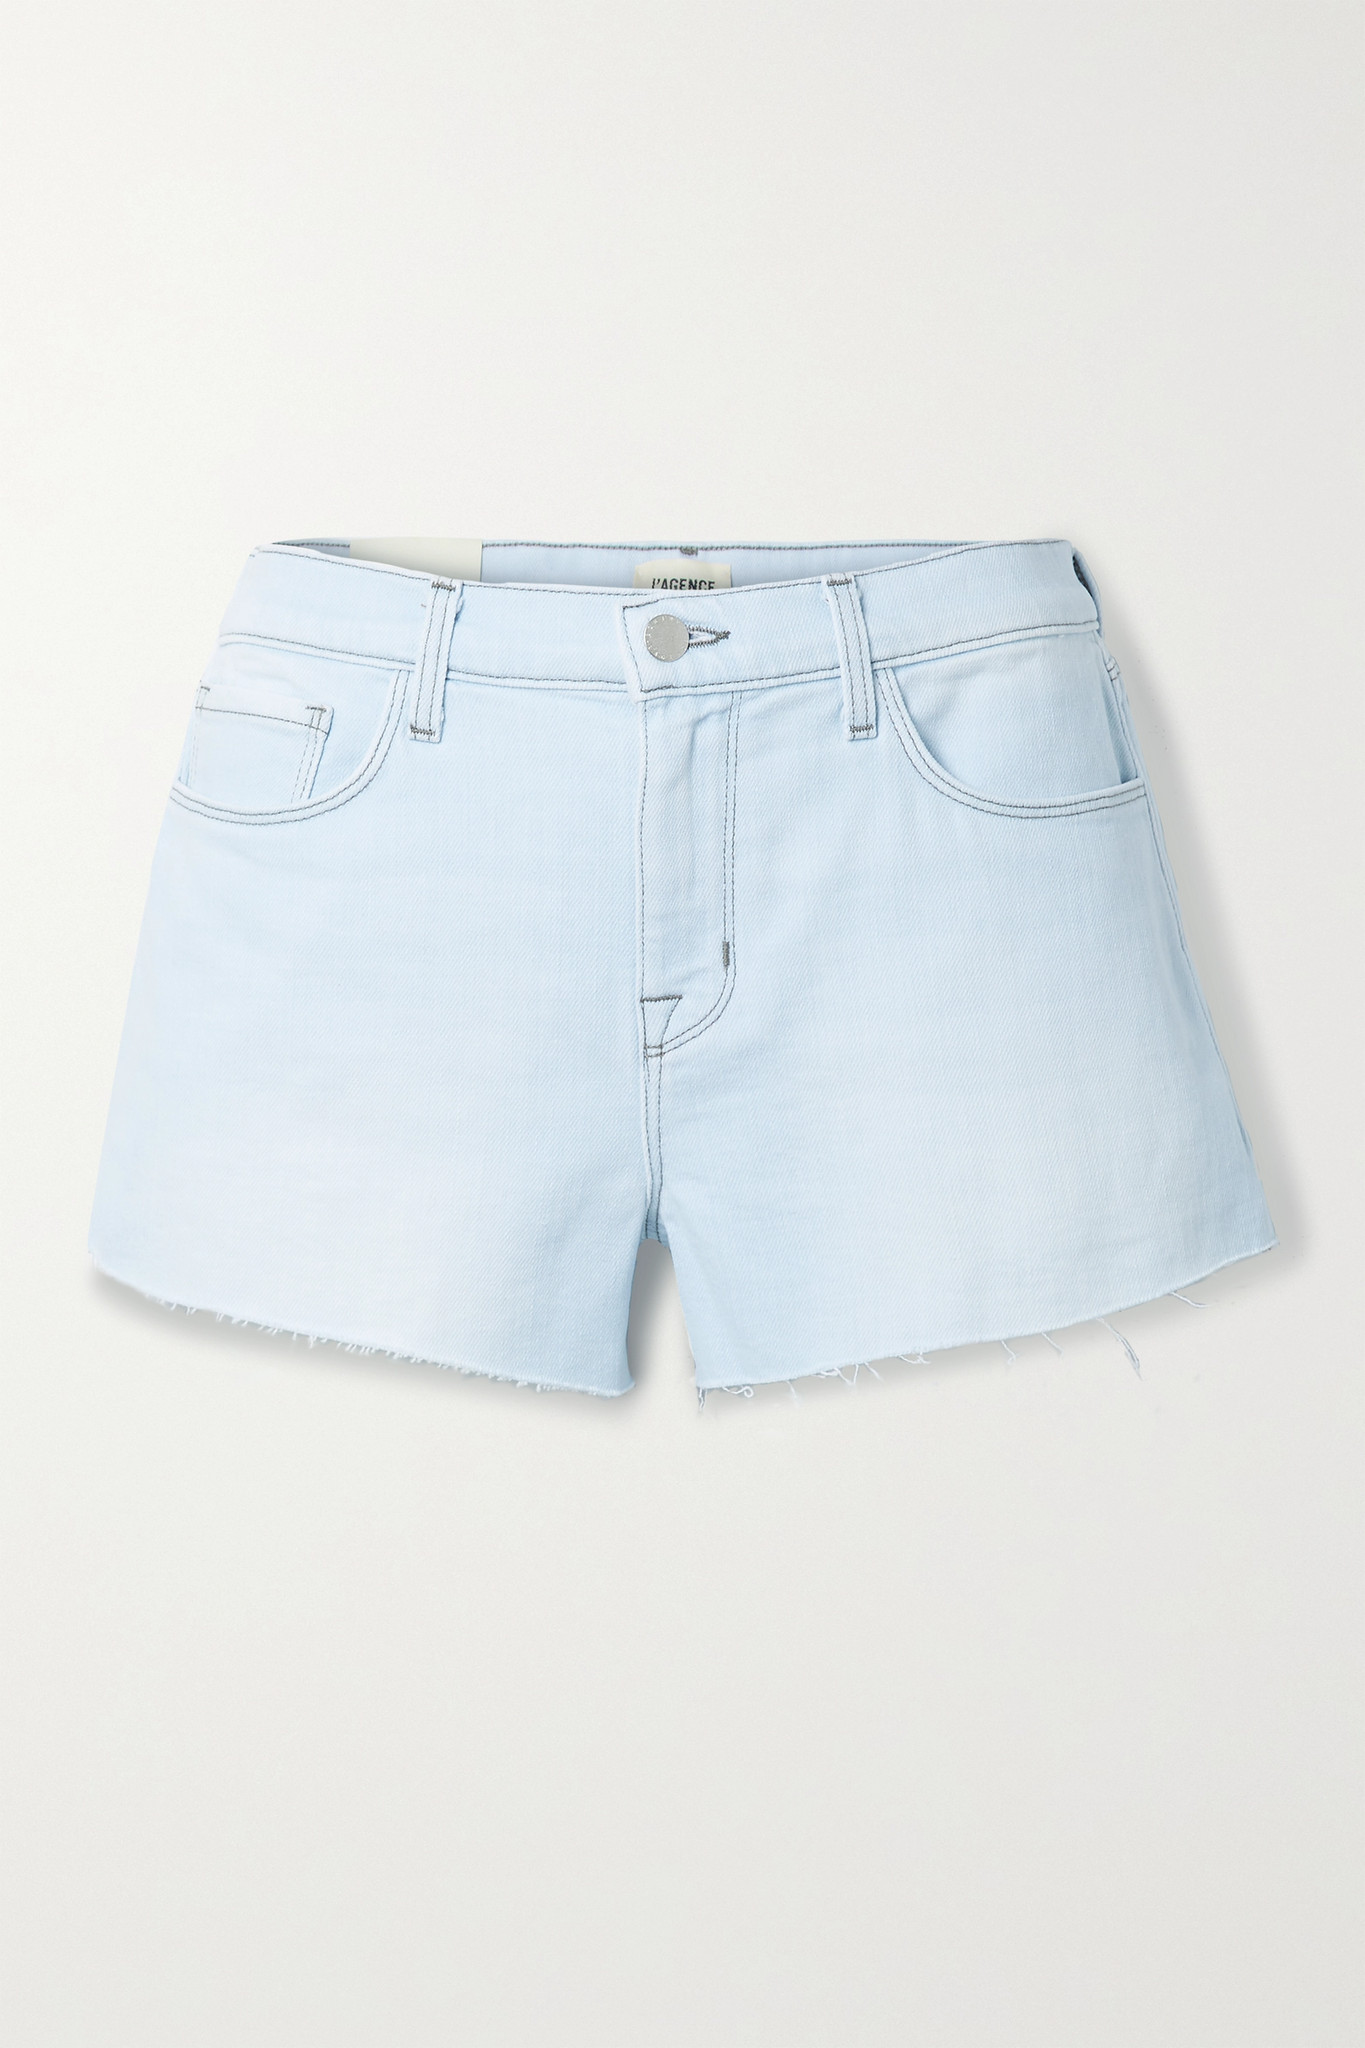 L'AGENCE - Audrey Frayed Denim Shorts - Blue - 27